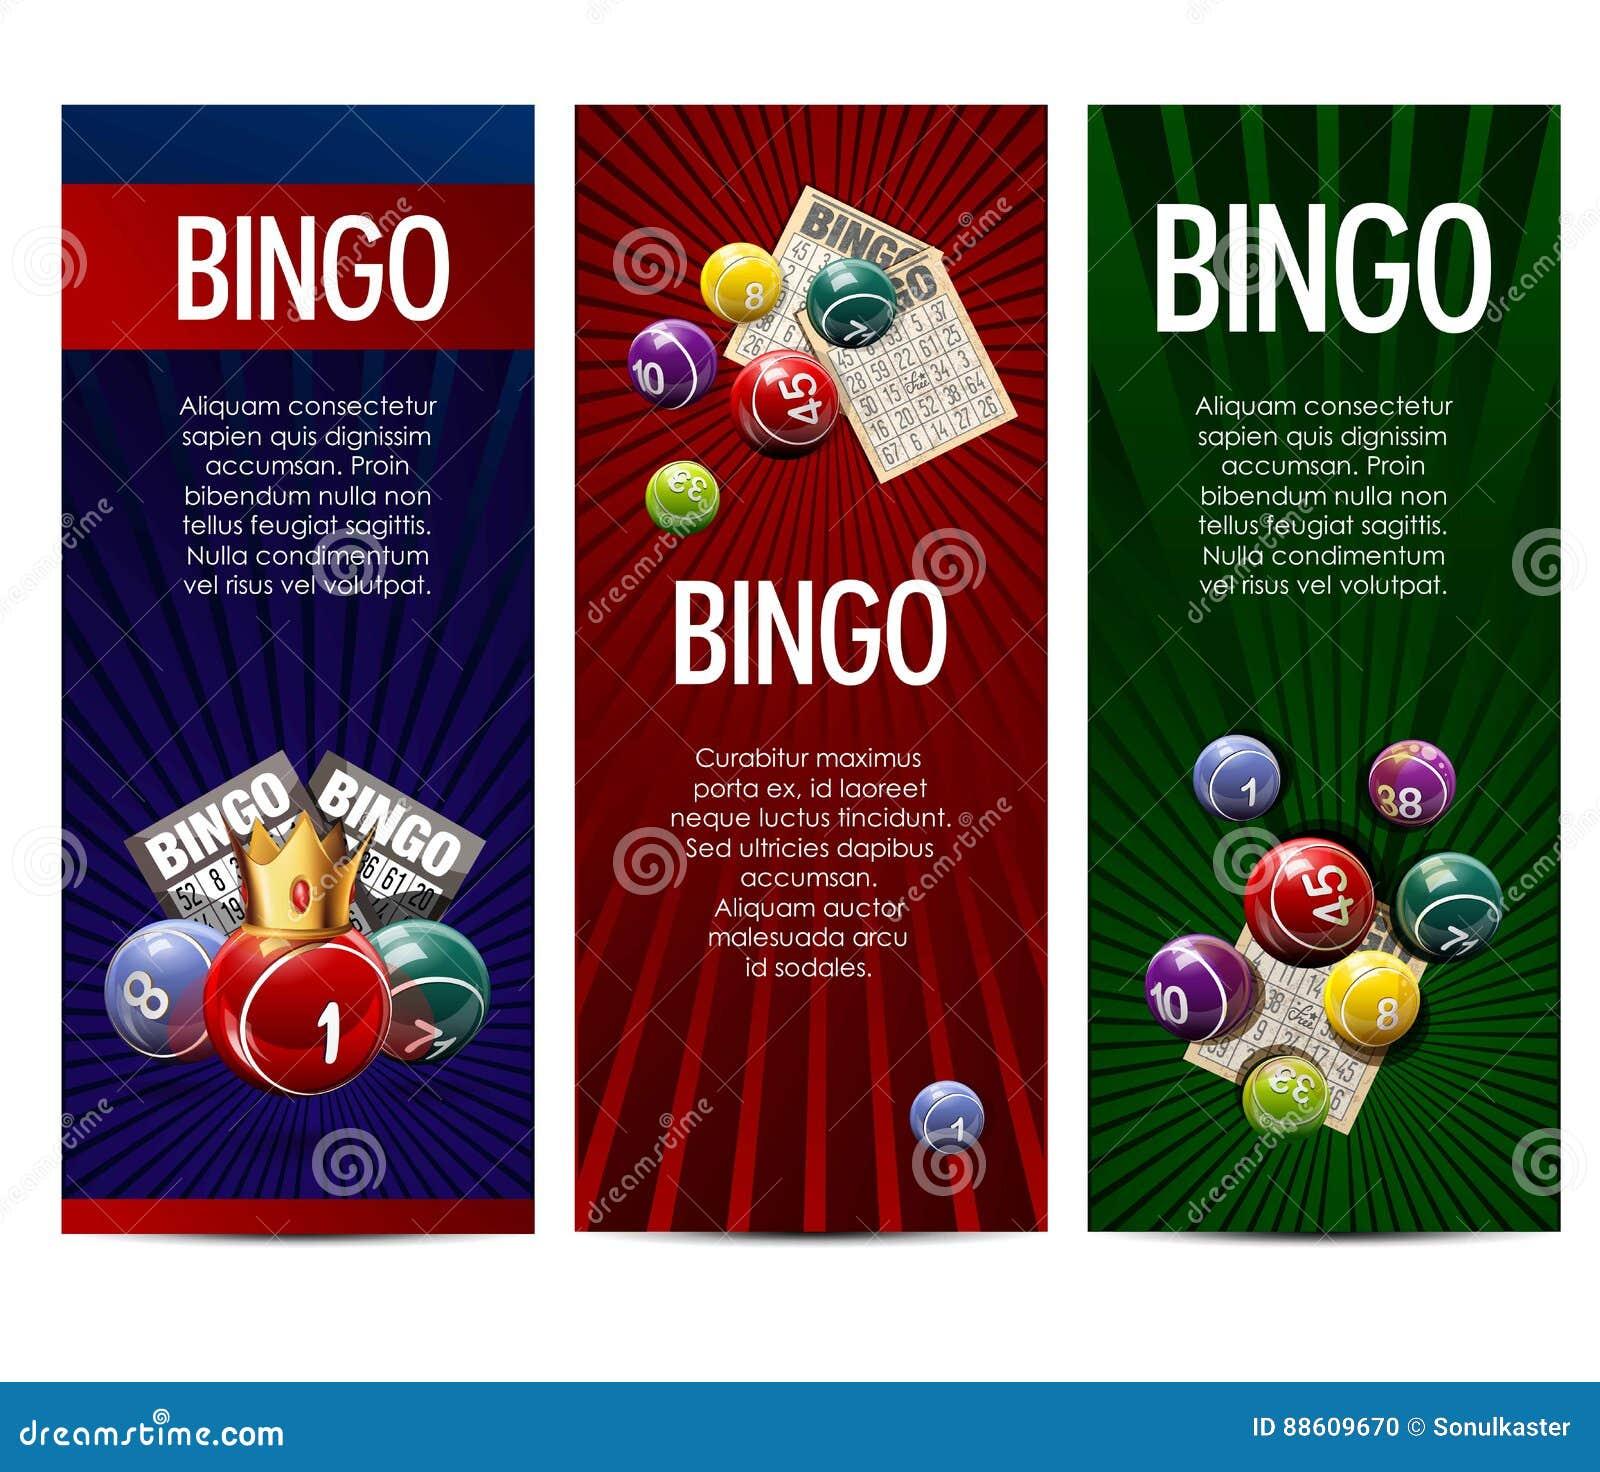 Bingo lottery lotto game vector banners set